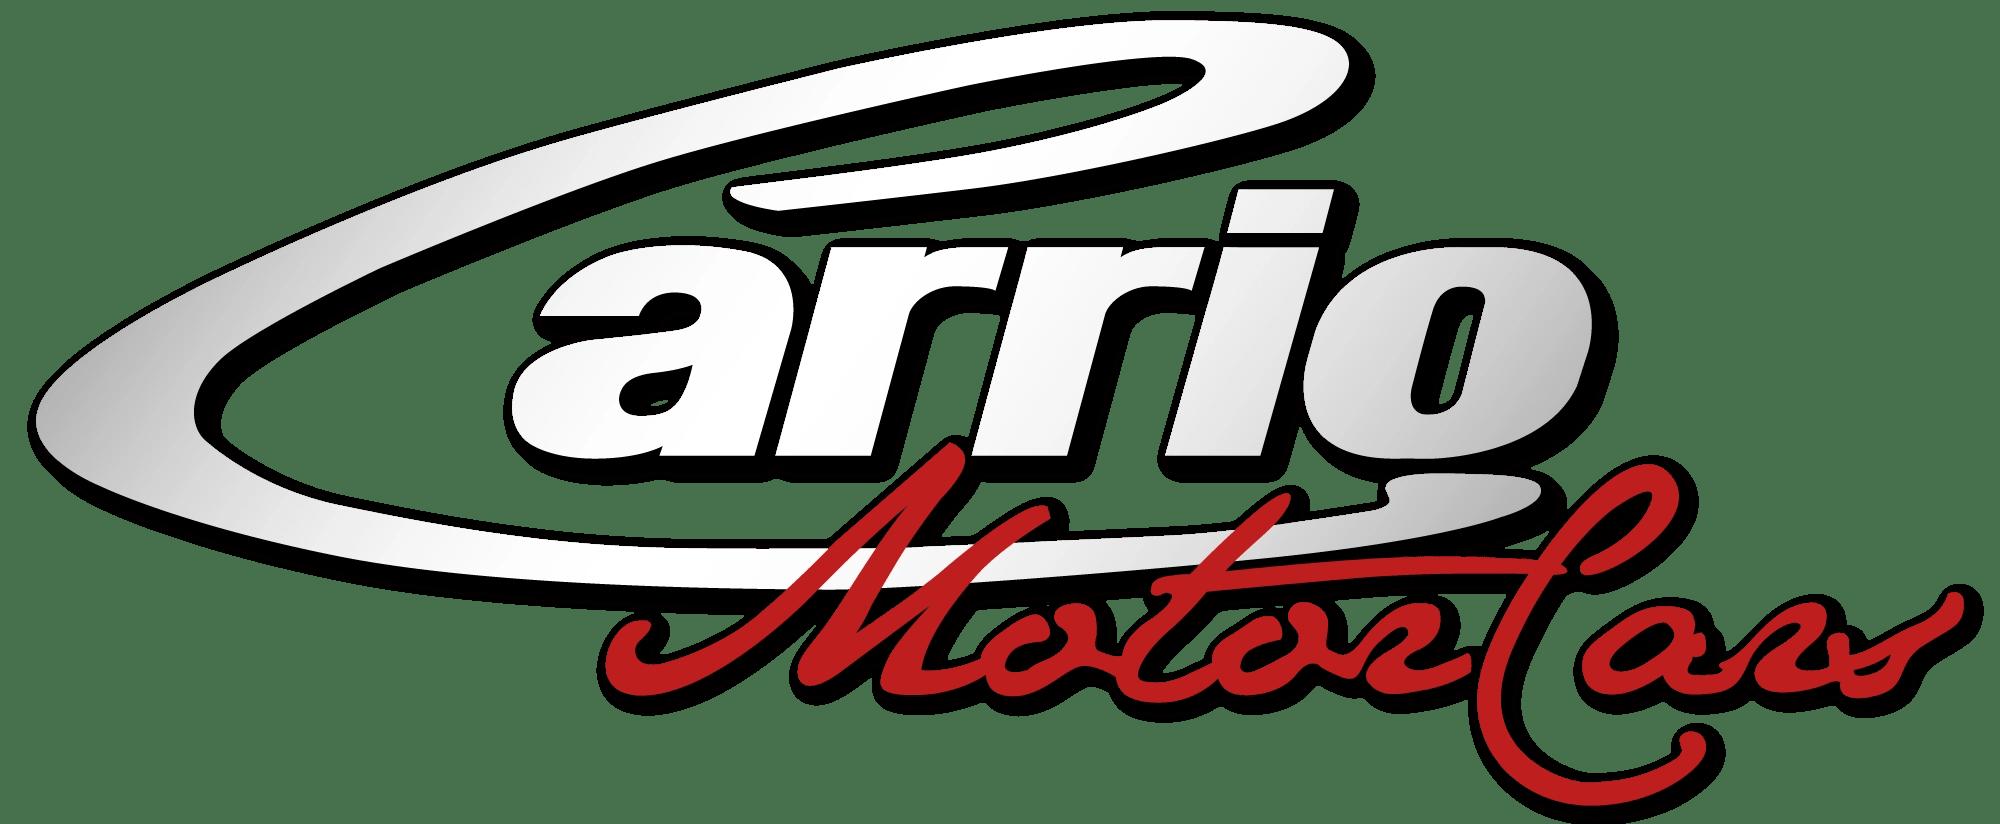 CARRIO-logo_transparent-on-dark-colors